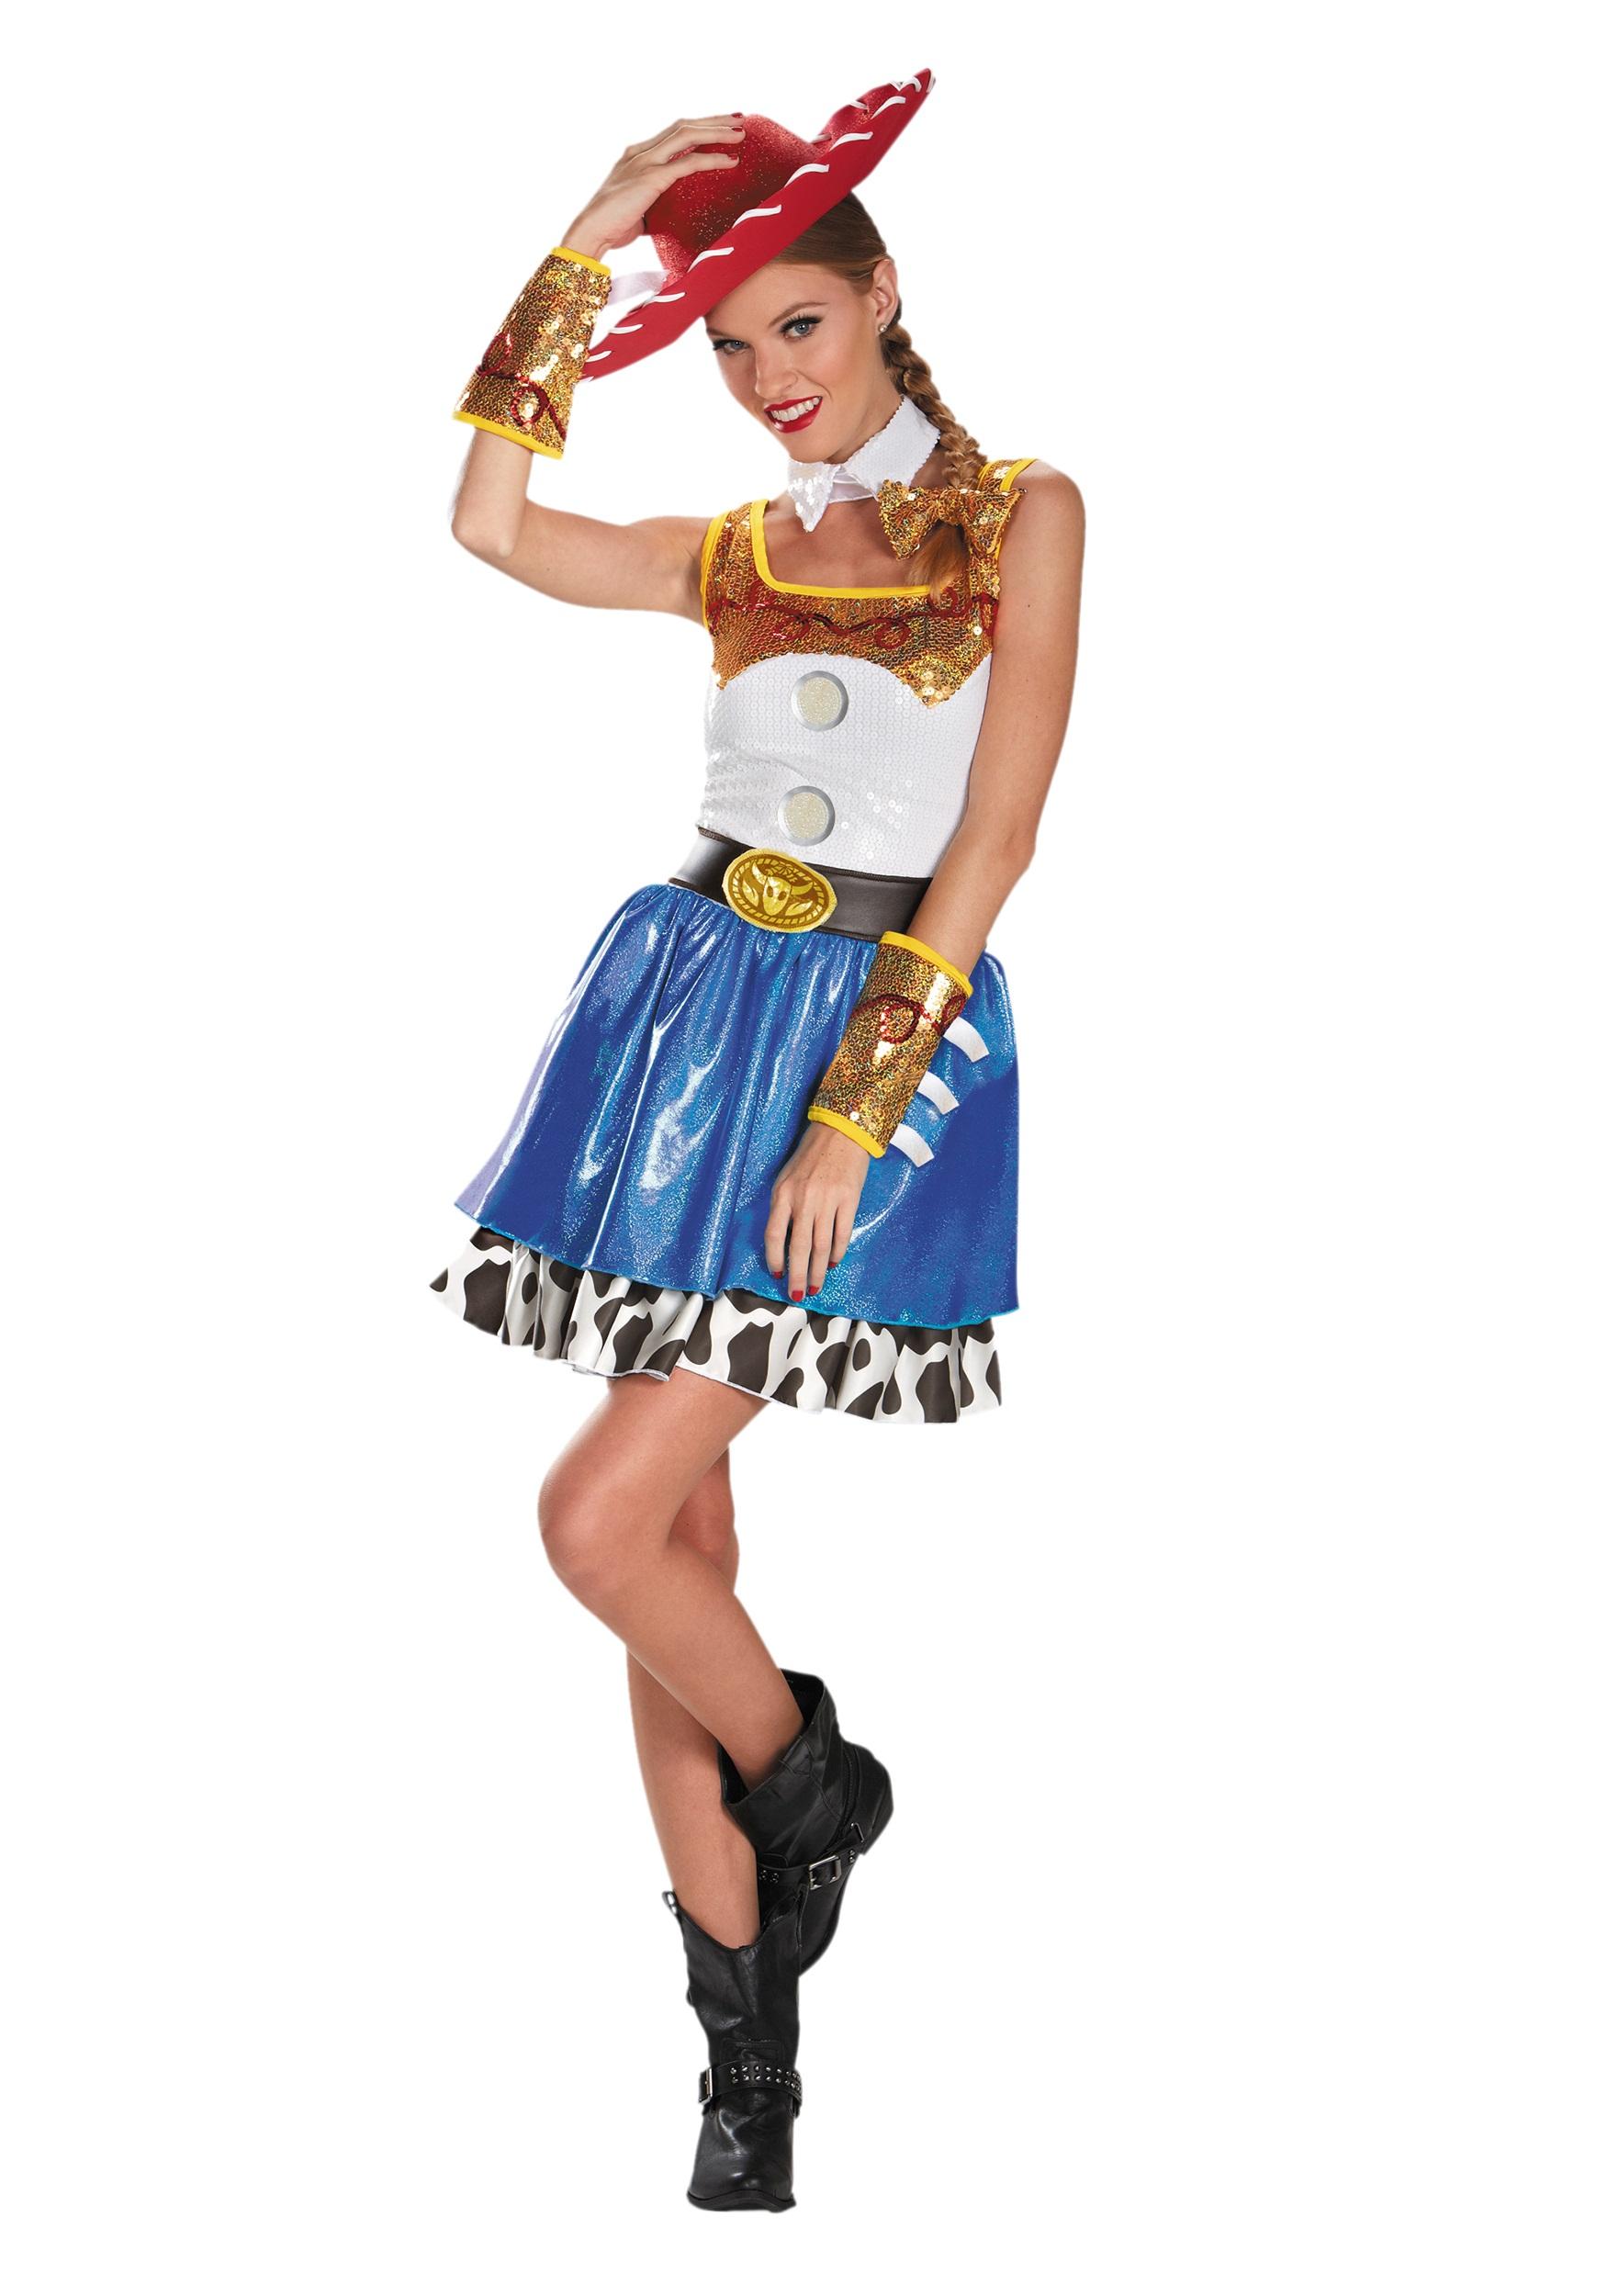 Women's Jessie Glam Cowgirl Costume